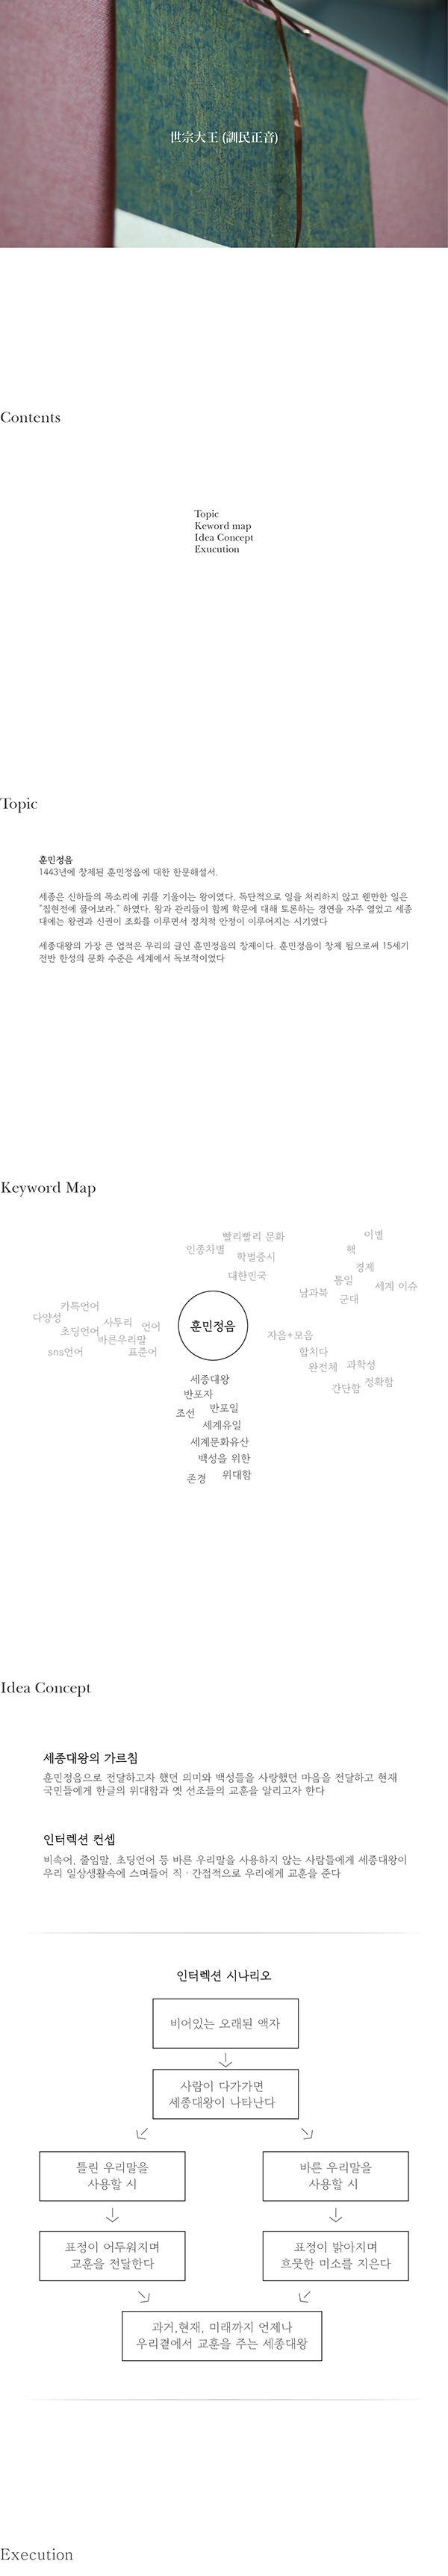 sejong the great on Behance